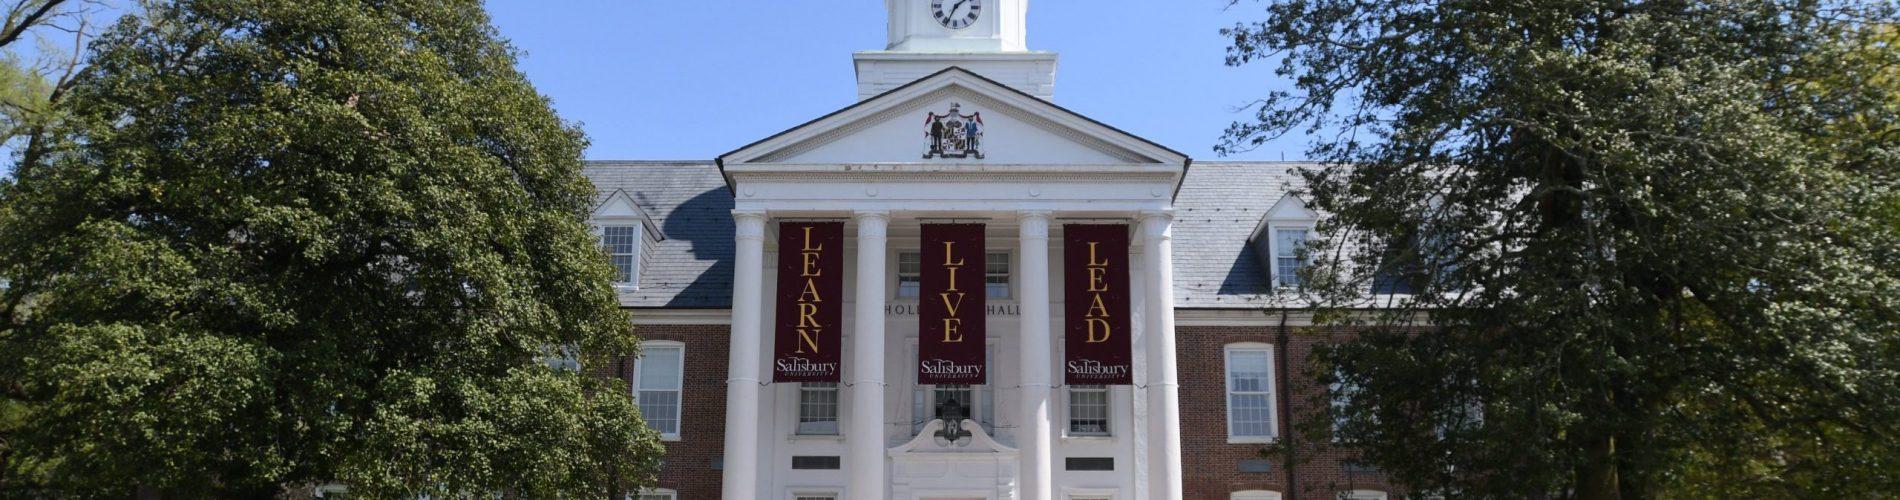 A photo of Holloway hall Salisbury university